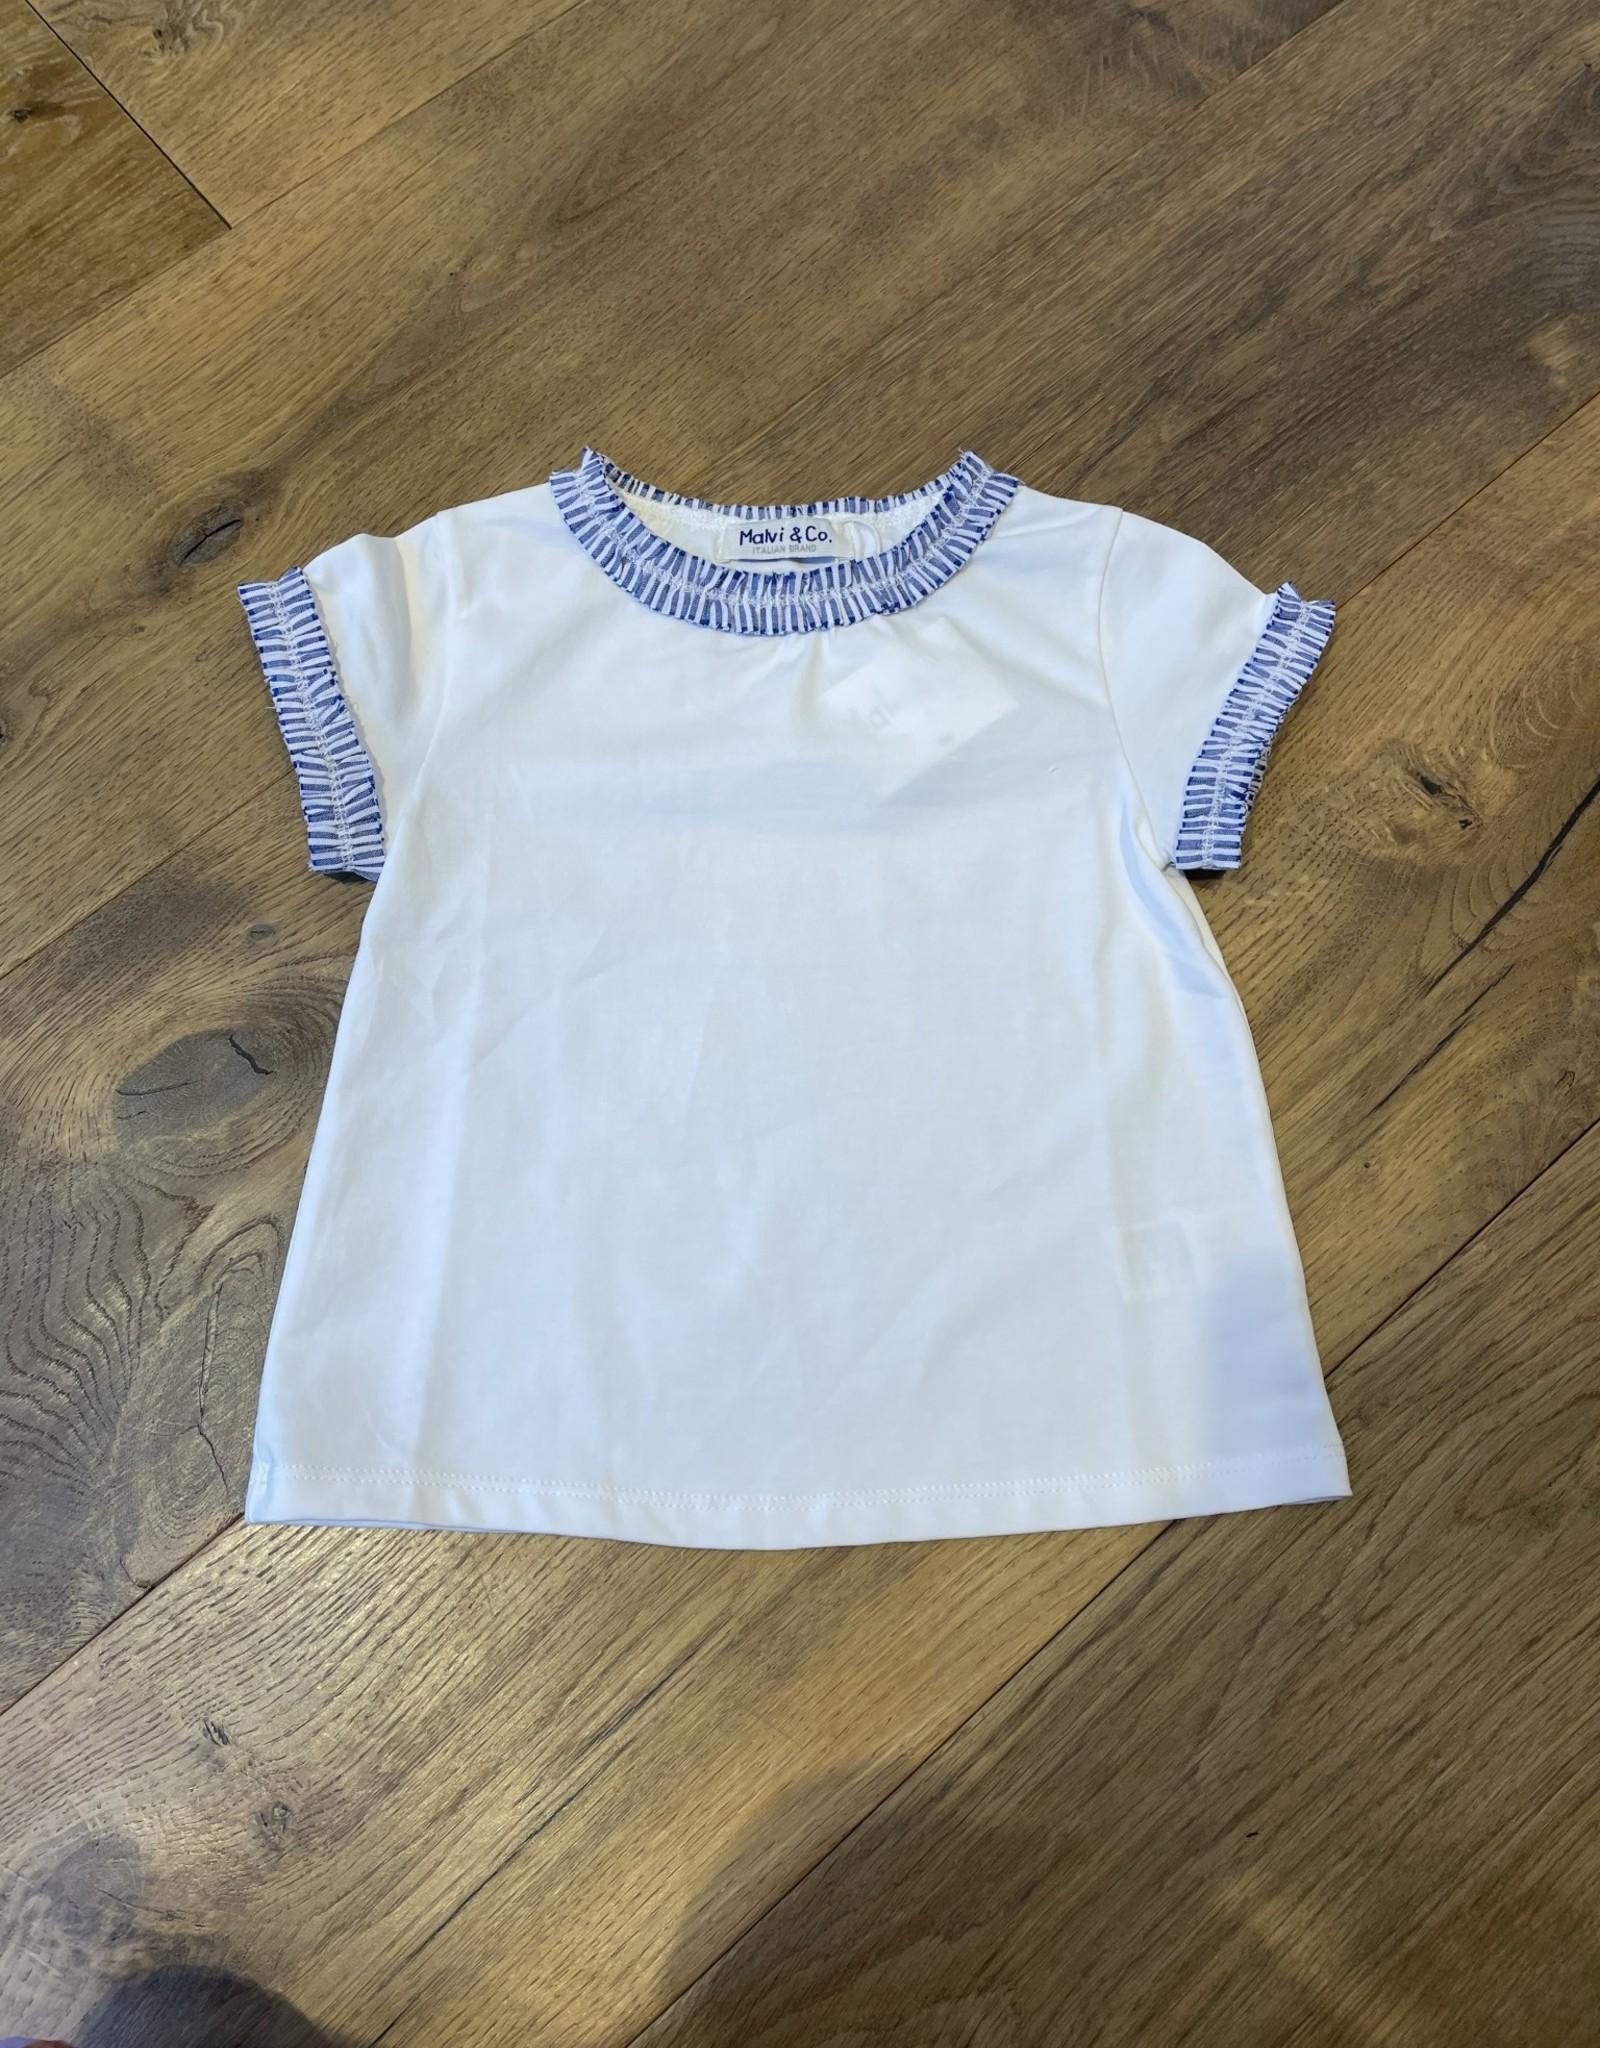 MALVI & CO MALVI & CO T-shirt blauw detail aan mouw